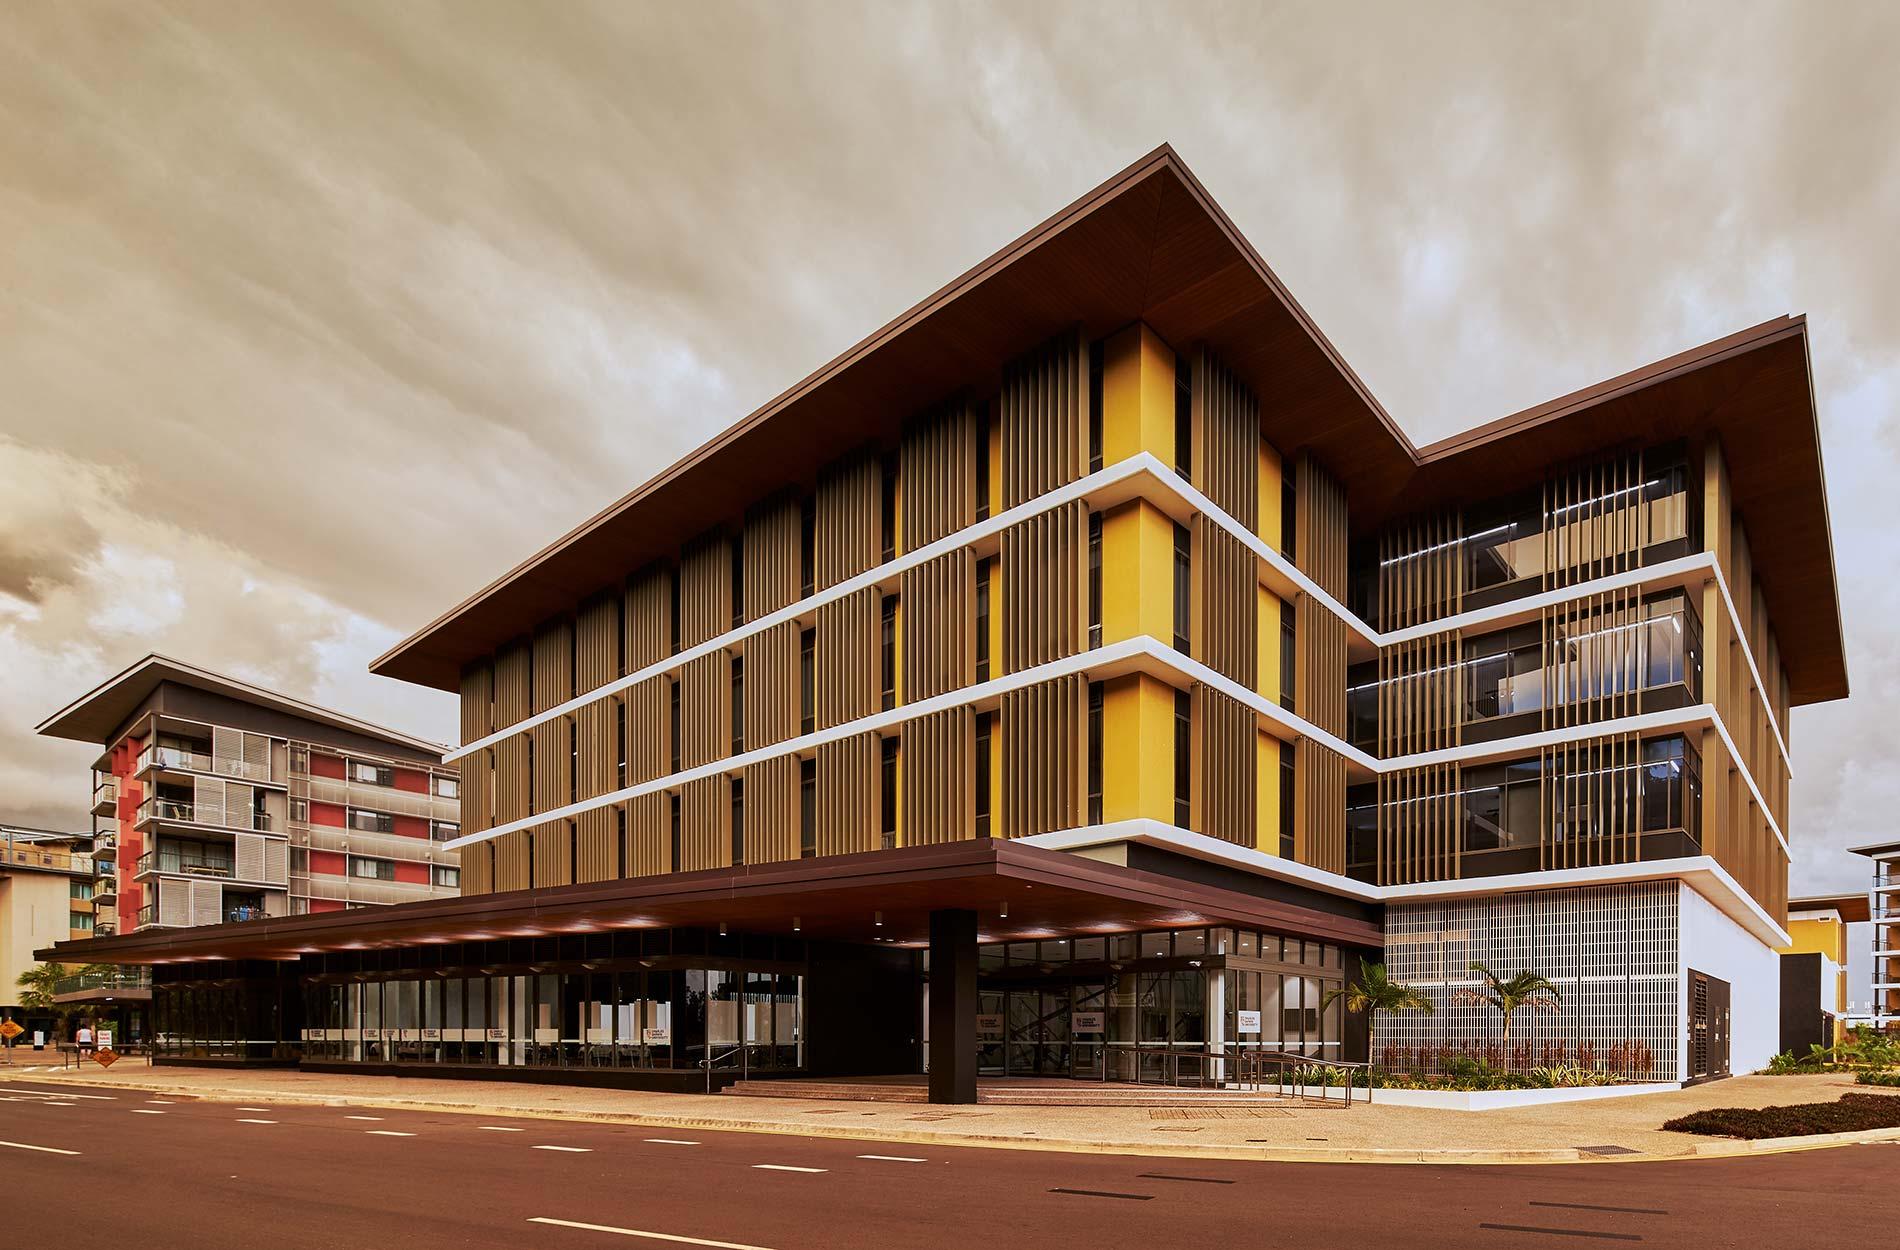 Charles Darwin University School of Business / Projects / Bates Smart